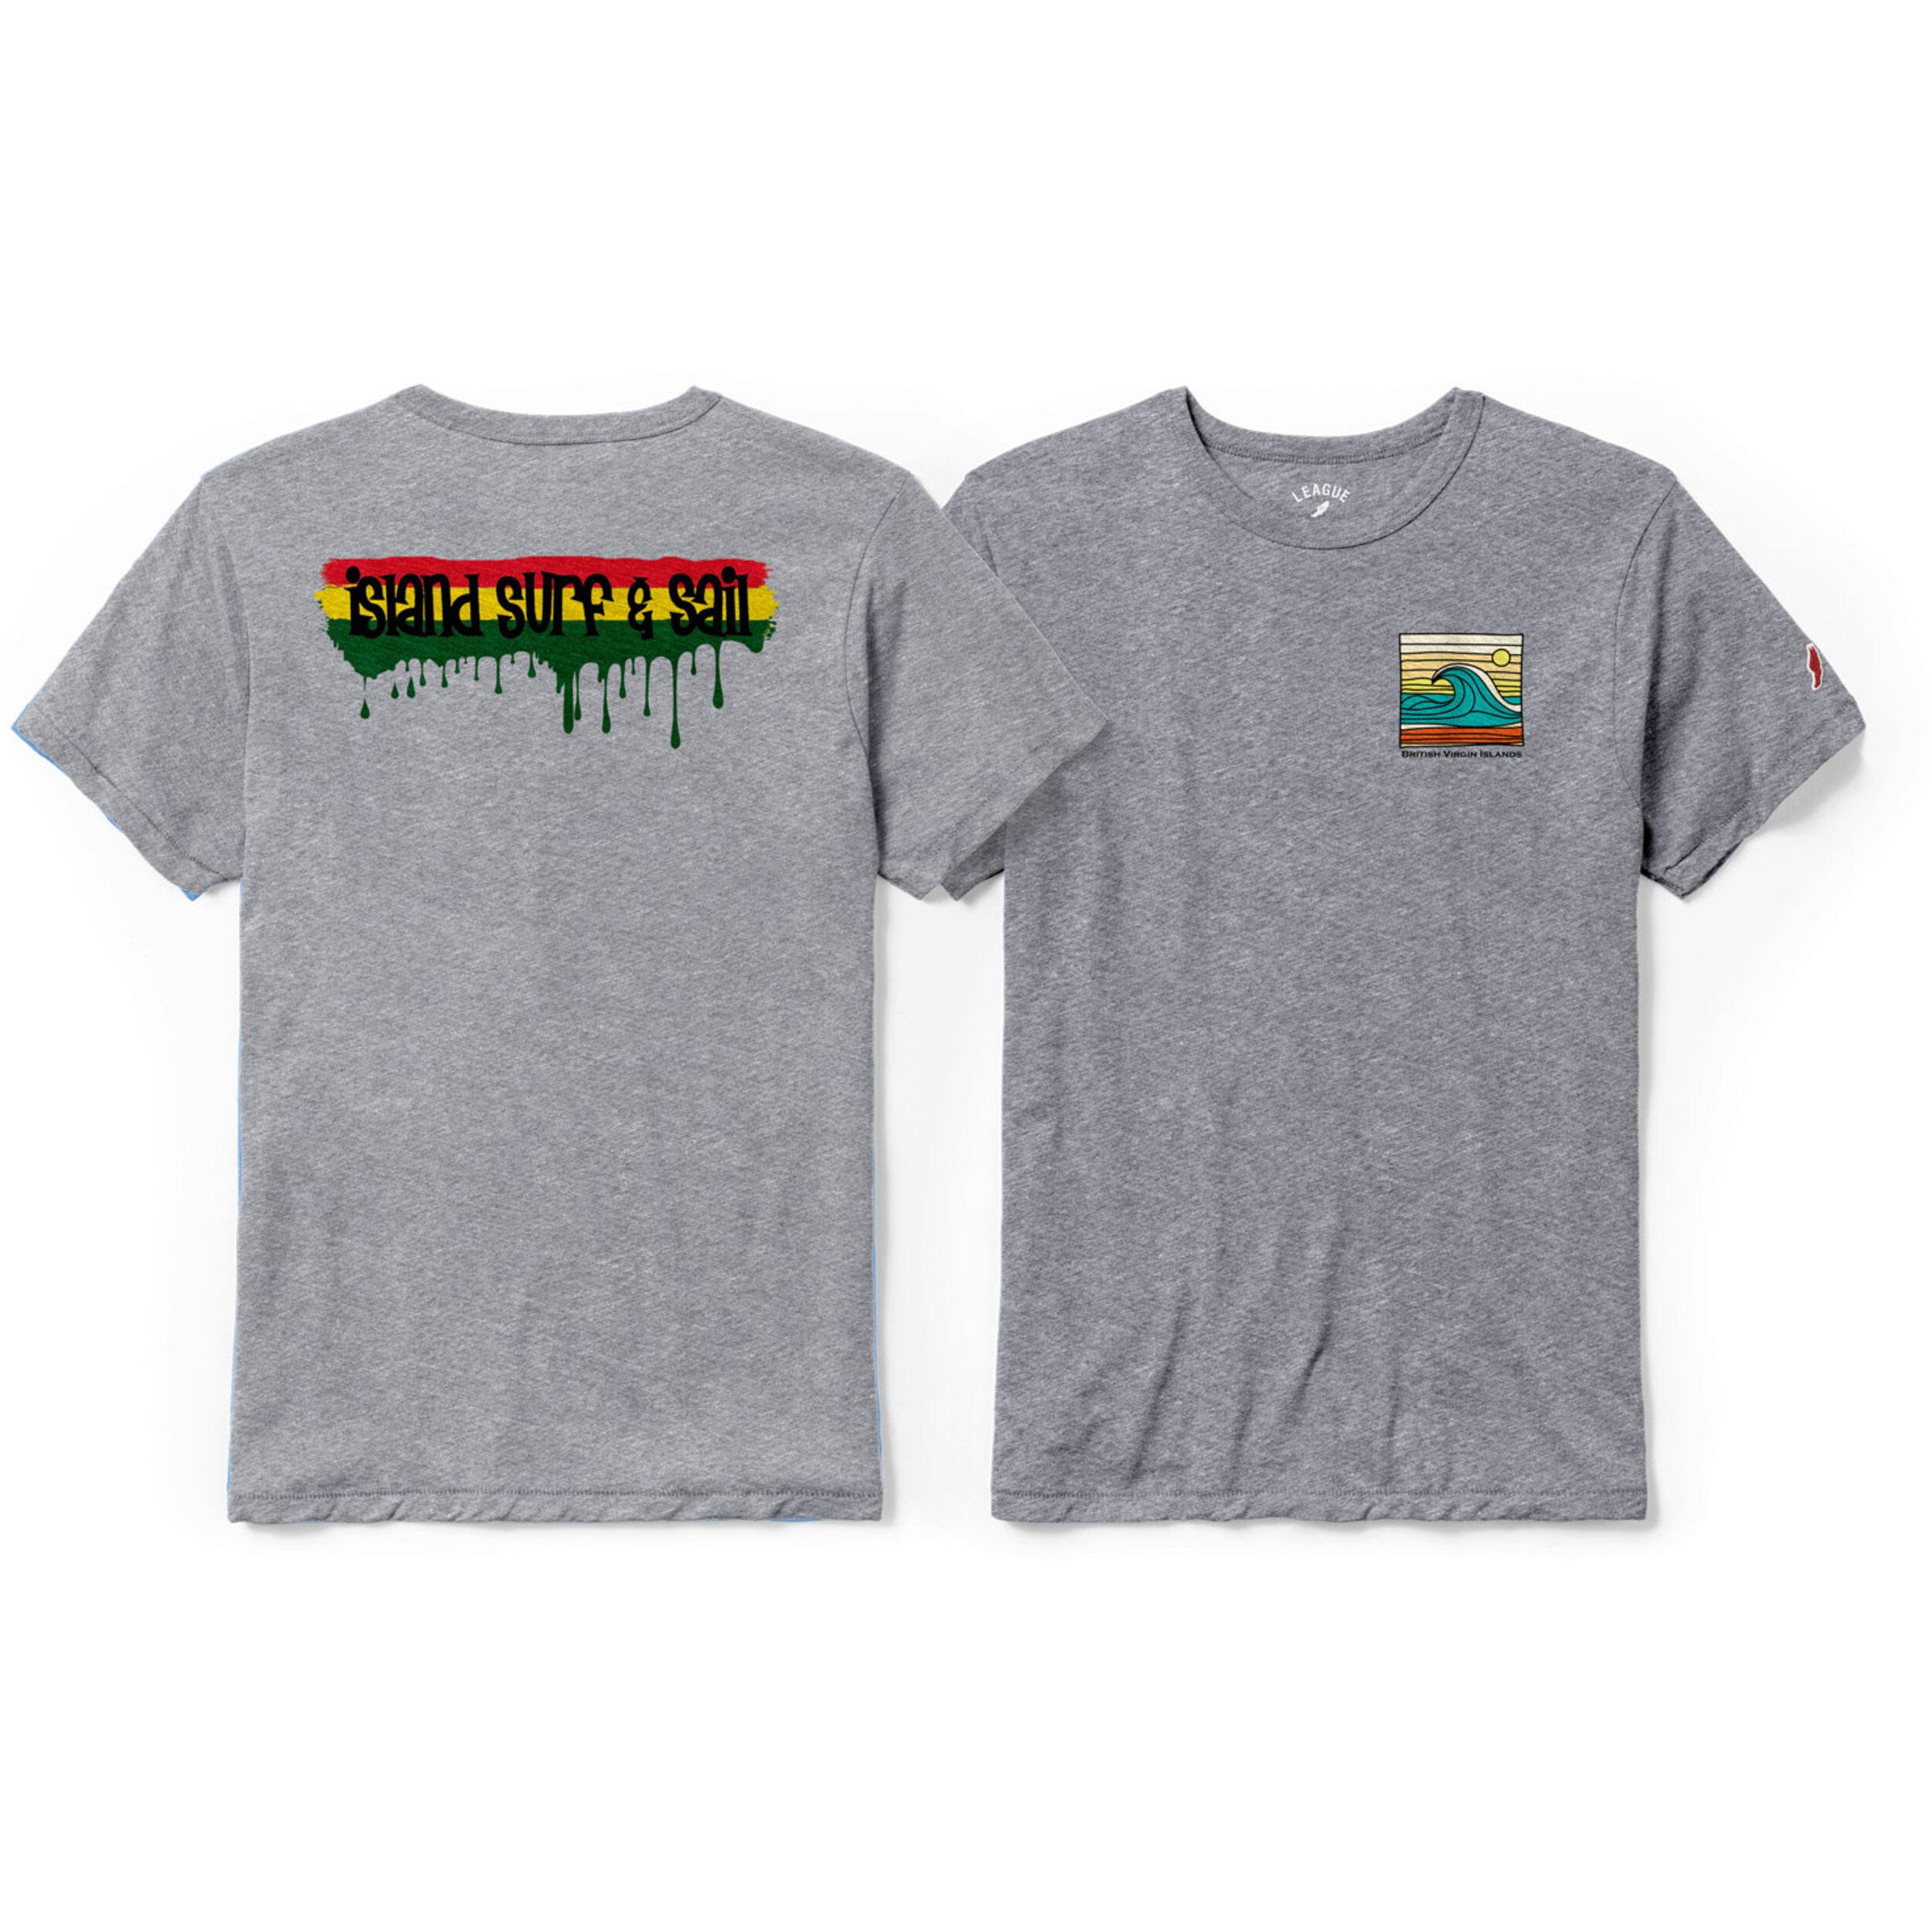 mens shirt 2